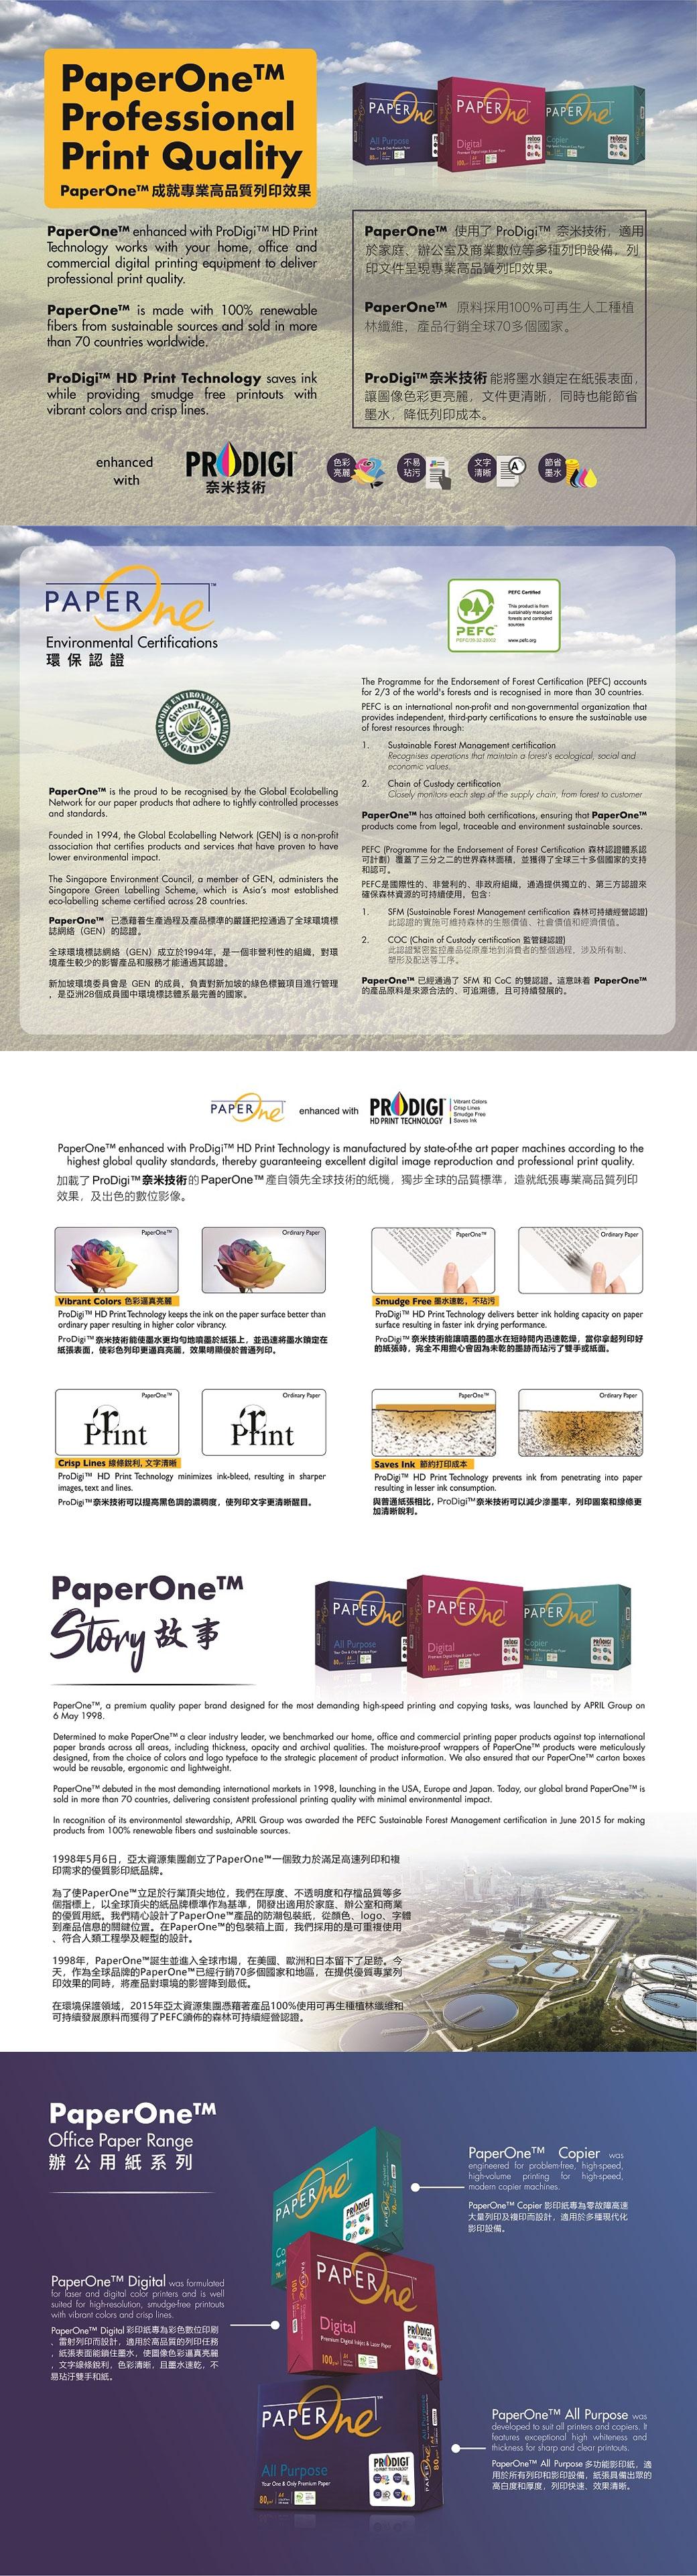 PaperOne กระดาษถ่ายเอกสารเอนกประสงค์ ขนาด A3 80แกรม (1 แพ็ค)